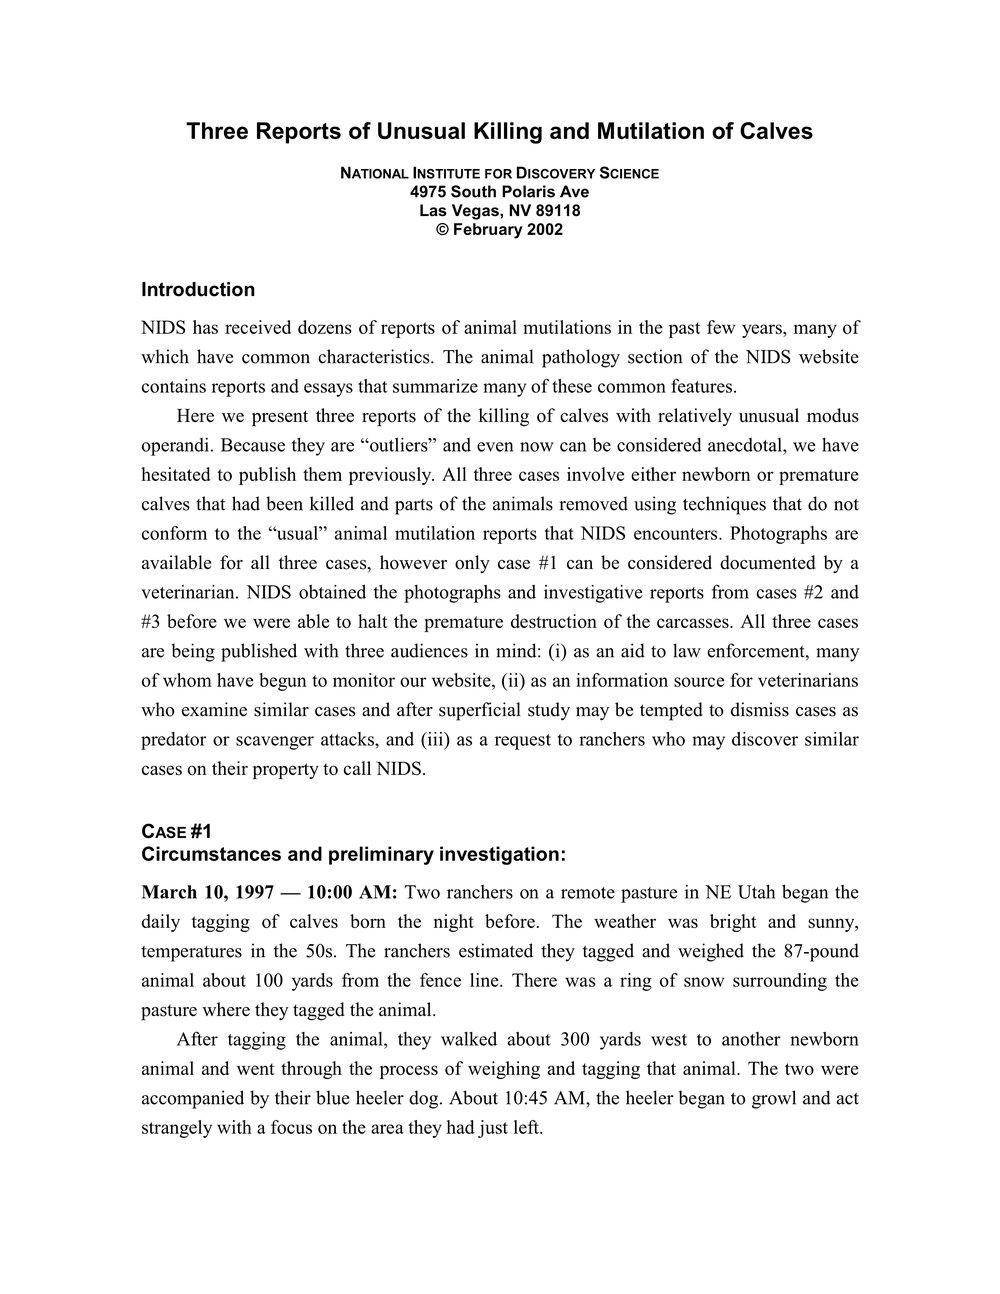 1997 ANIMAL MUTILATION REPORT.jpg